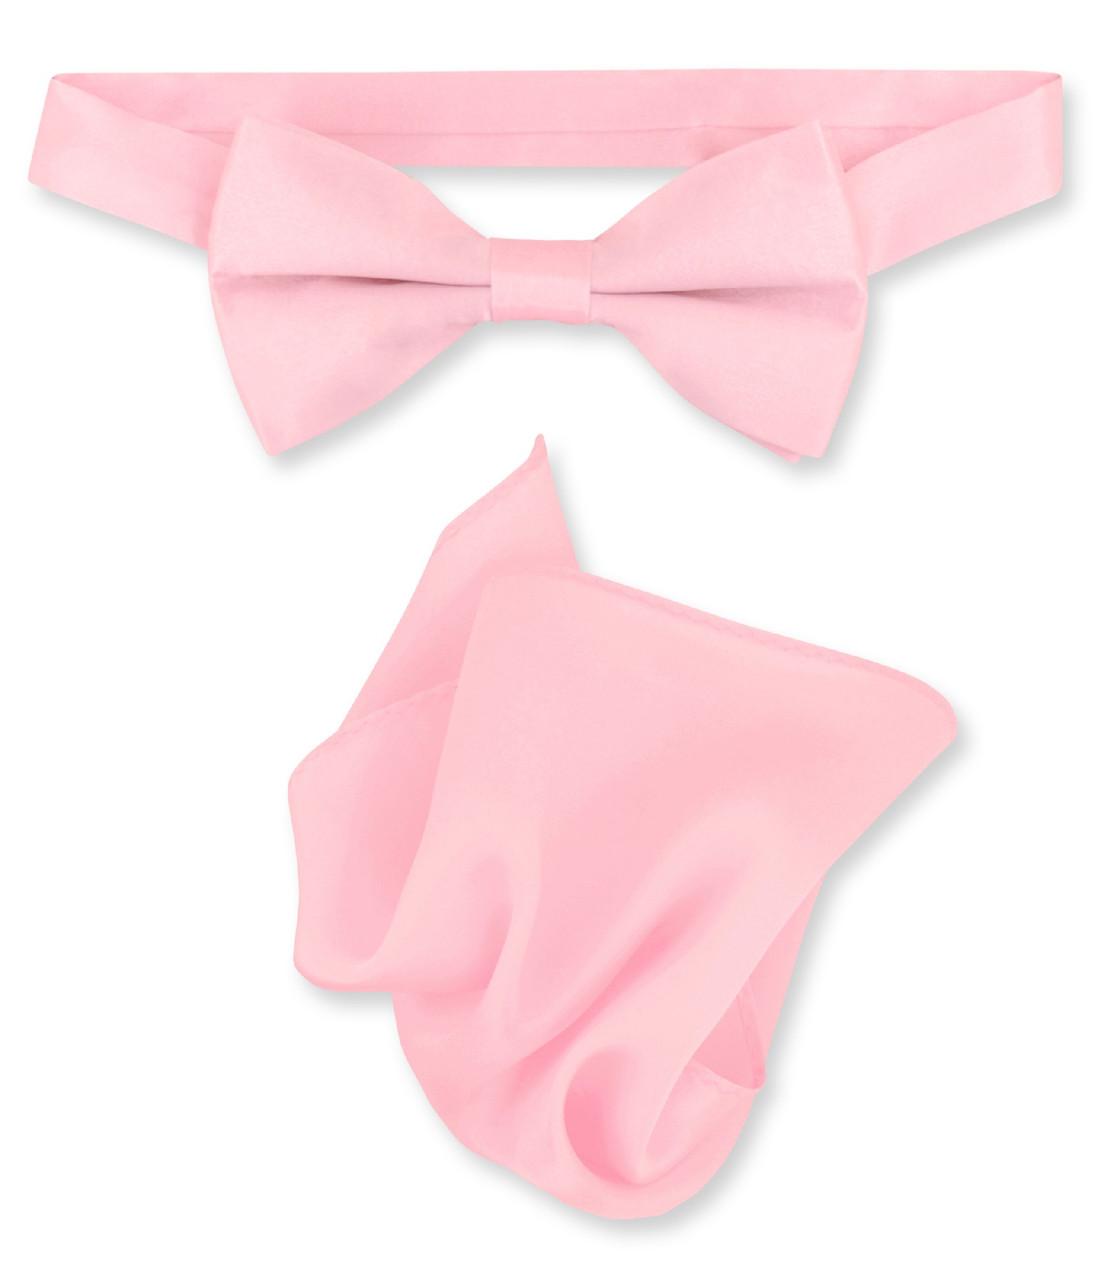 afe5df5fc262 Light Pink Bow Tie And Handkerchief Set | Silk BowTie Hanky Set